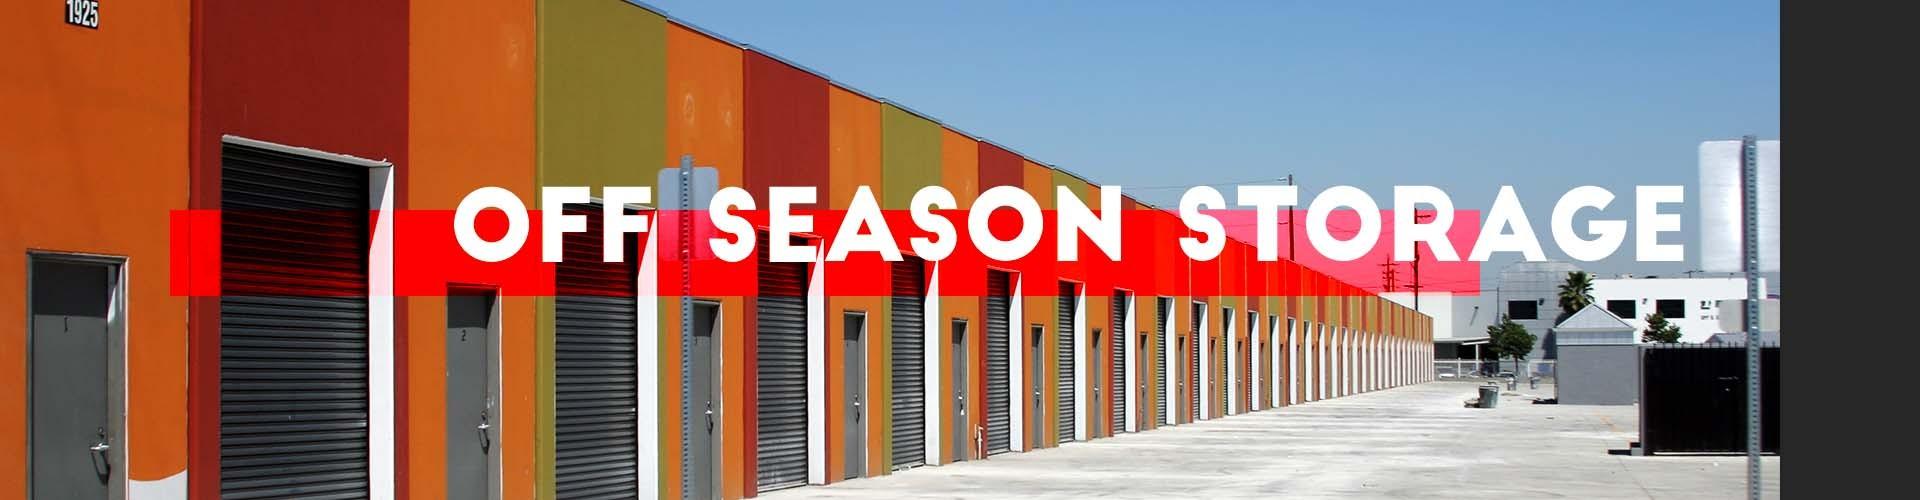 off season storage